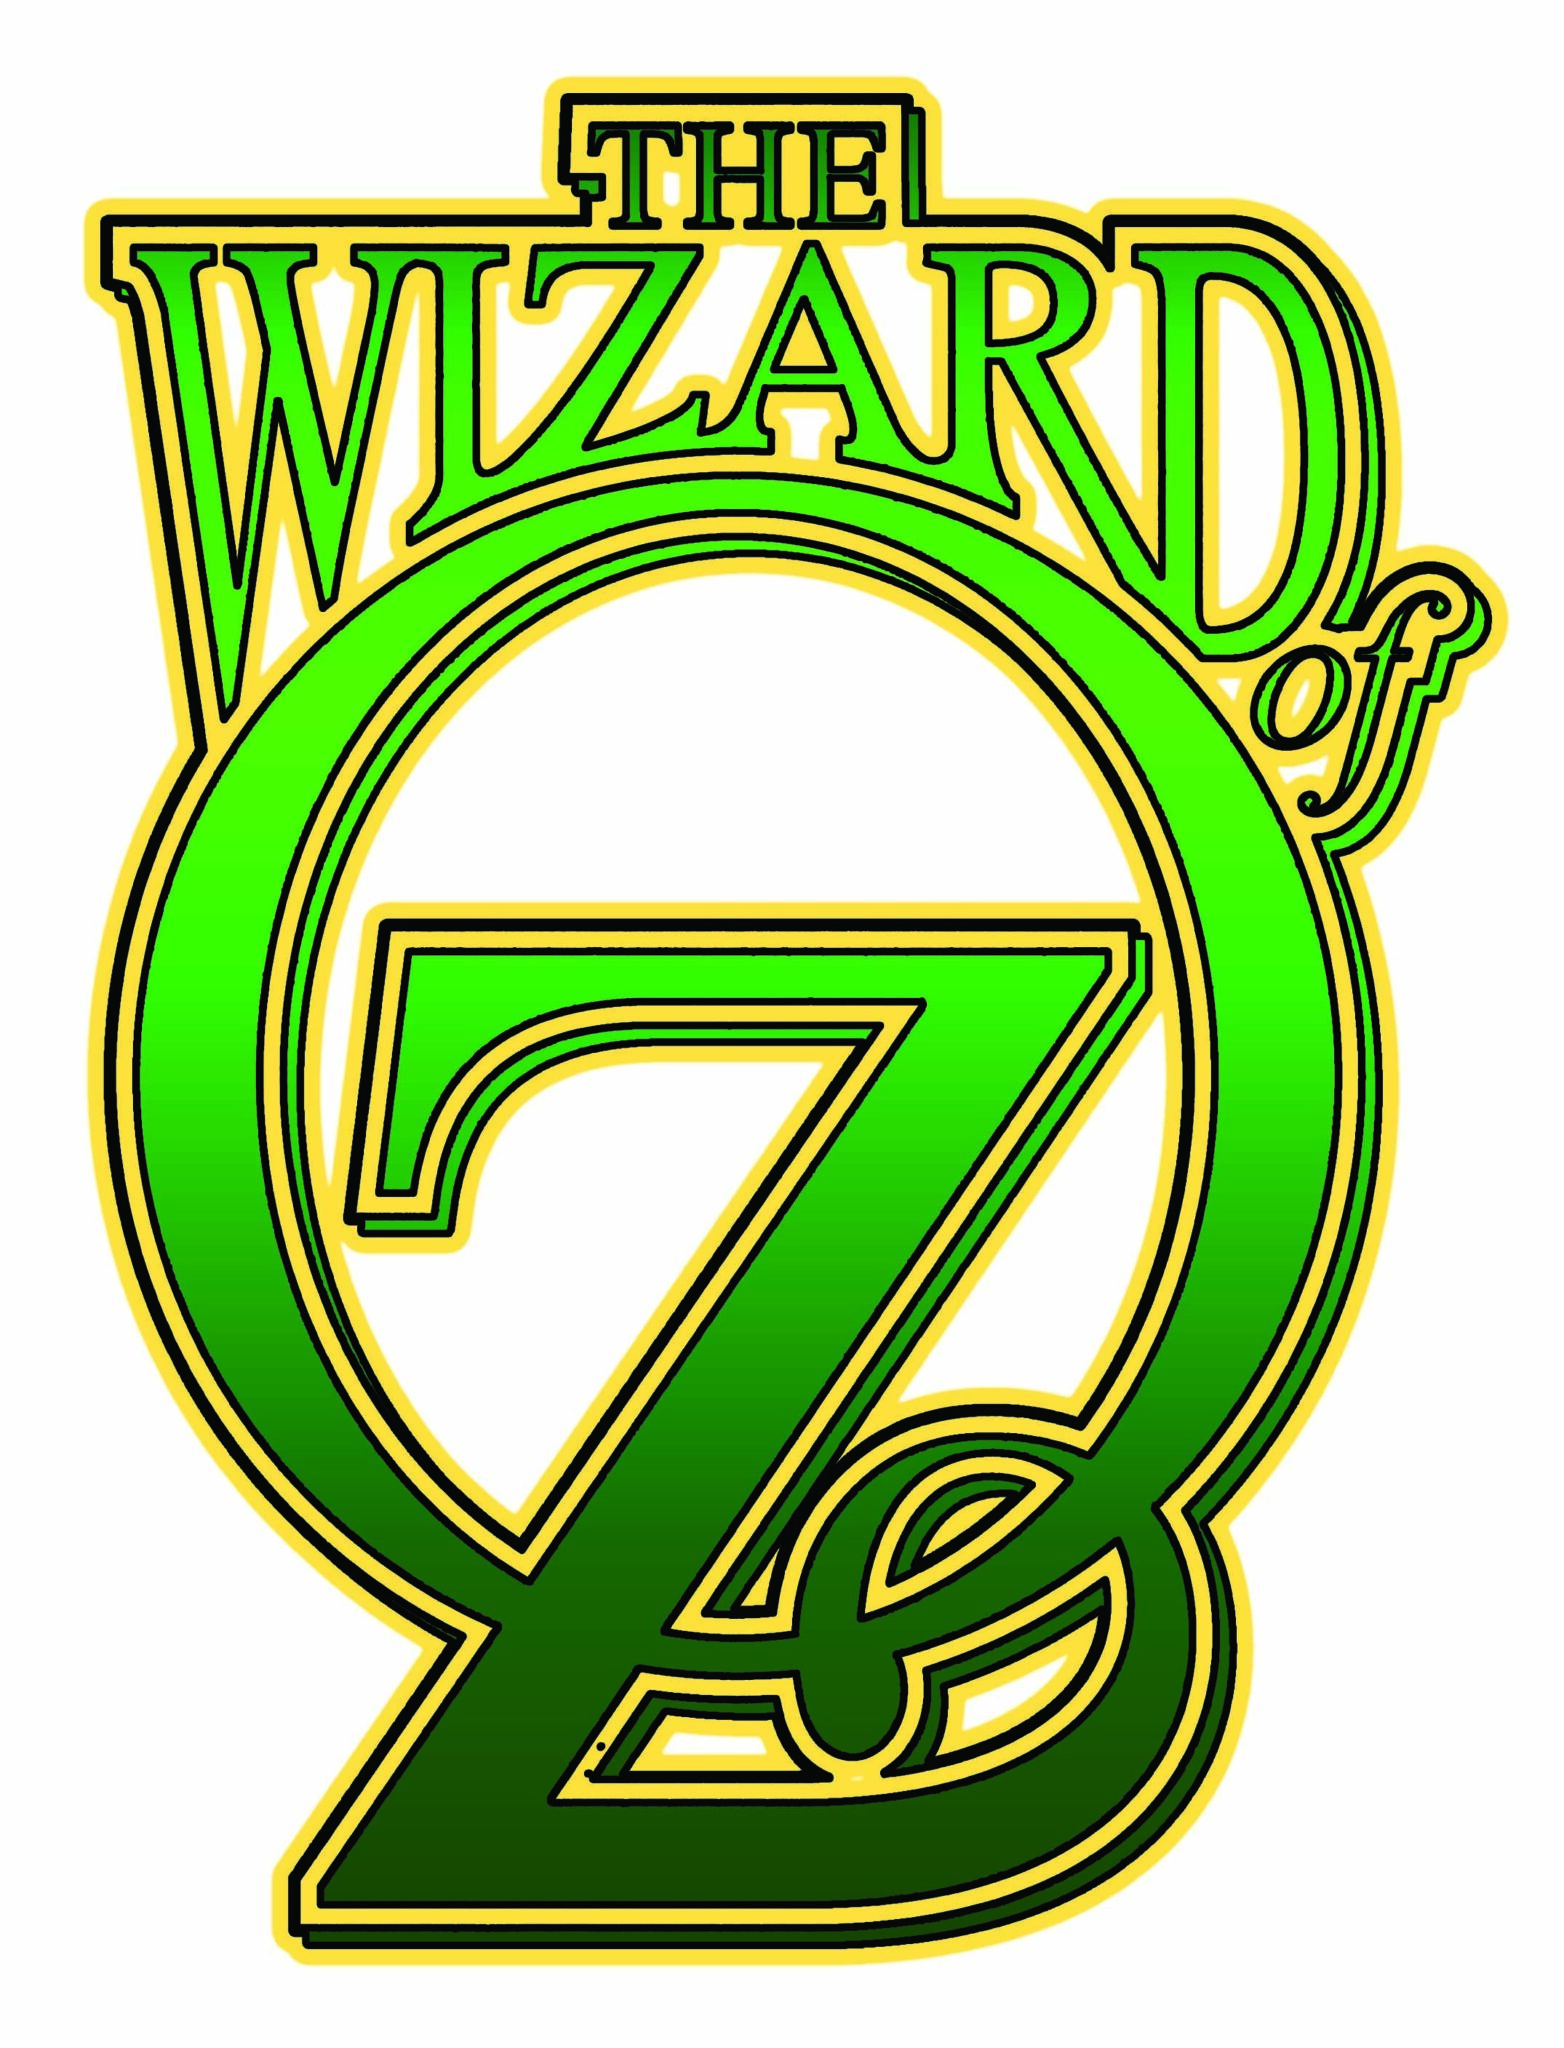 Arrogance is not confidence Arrogance is the Wizard of Oz